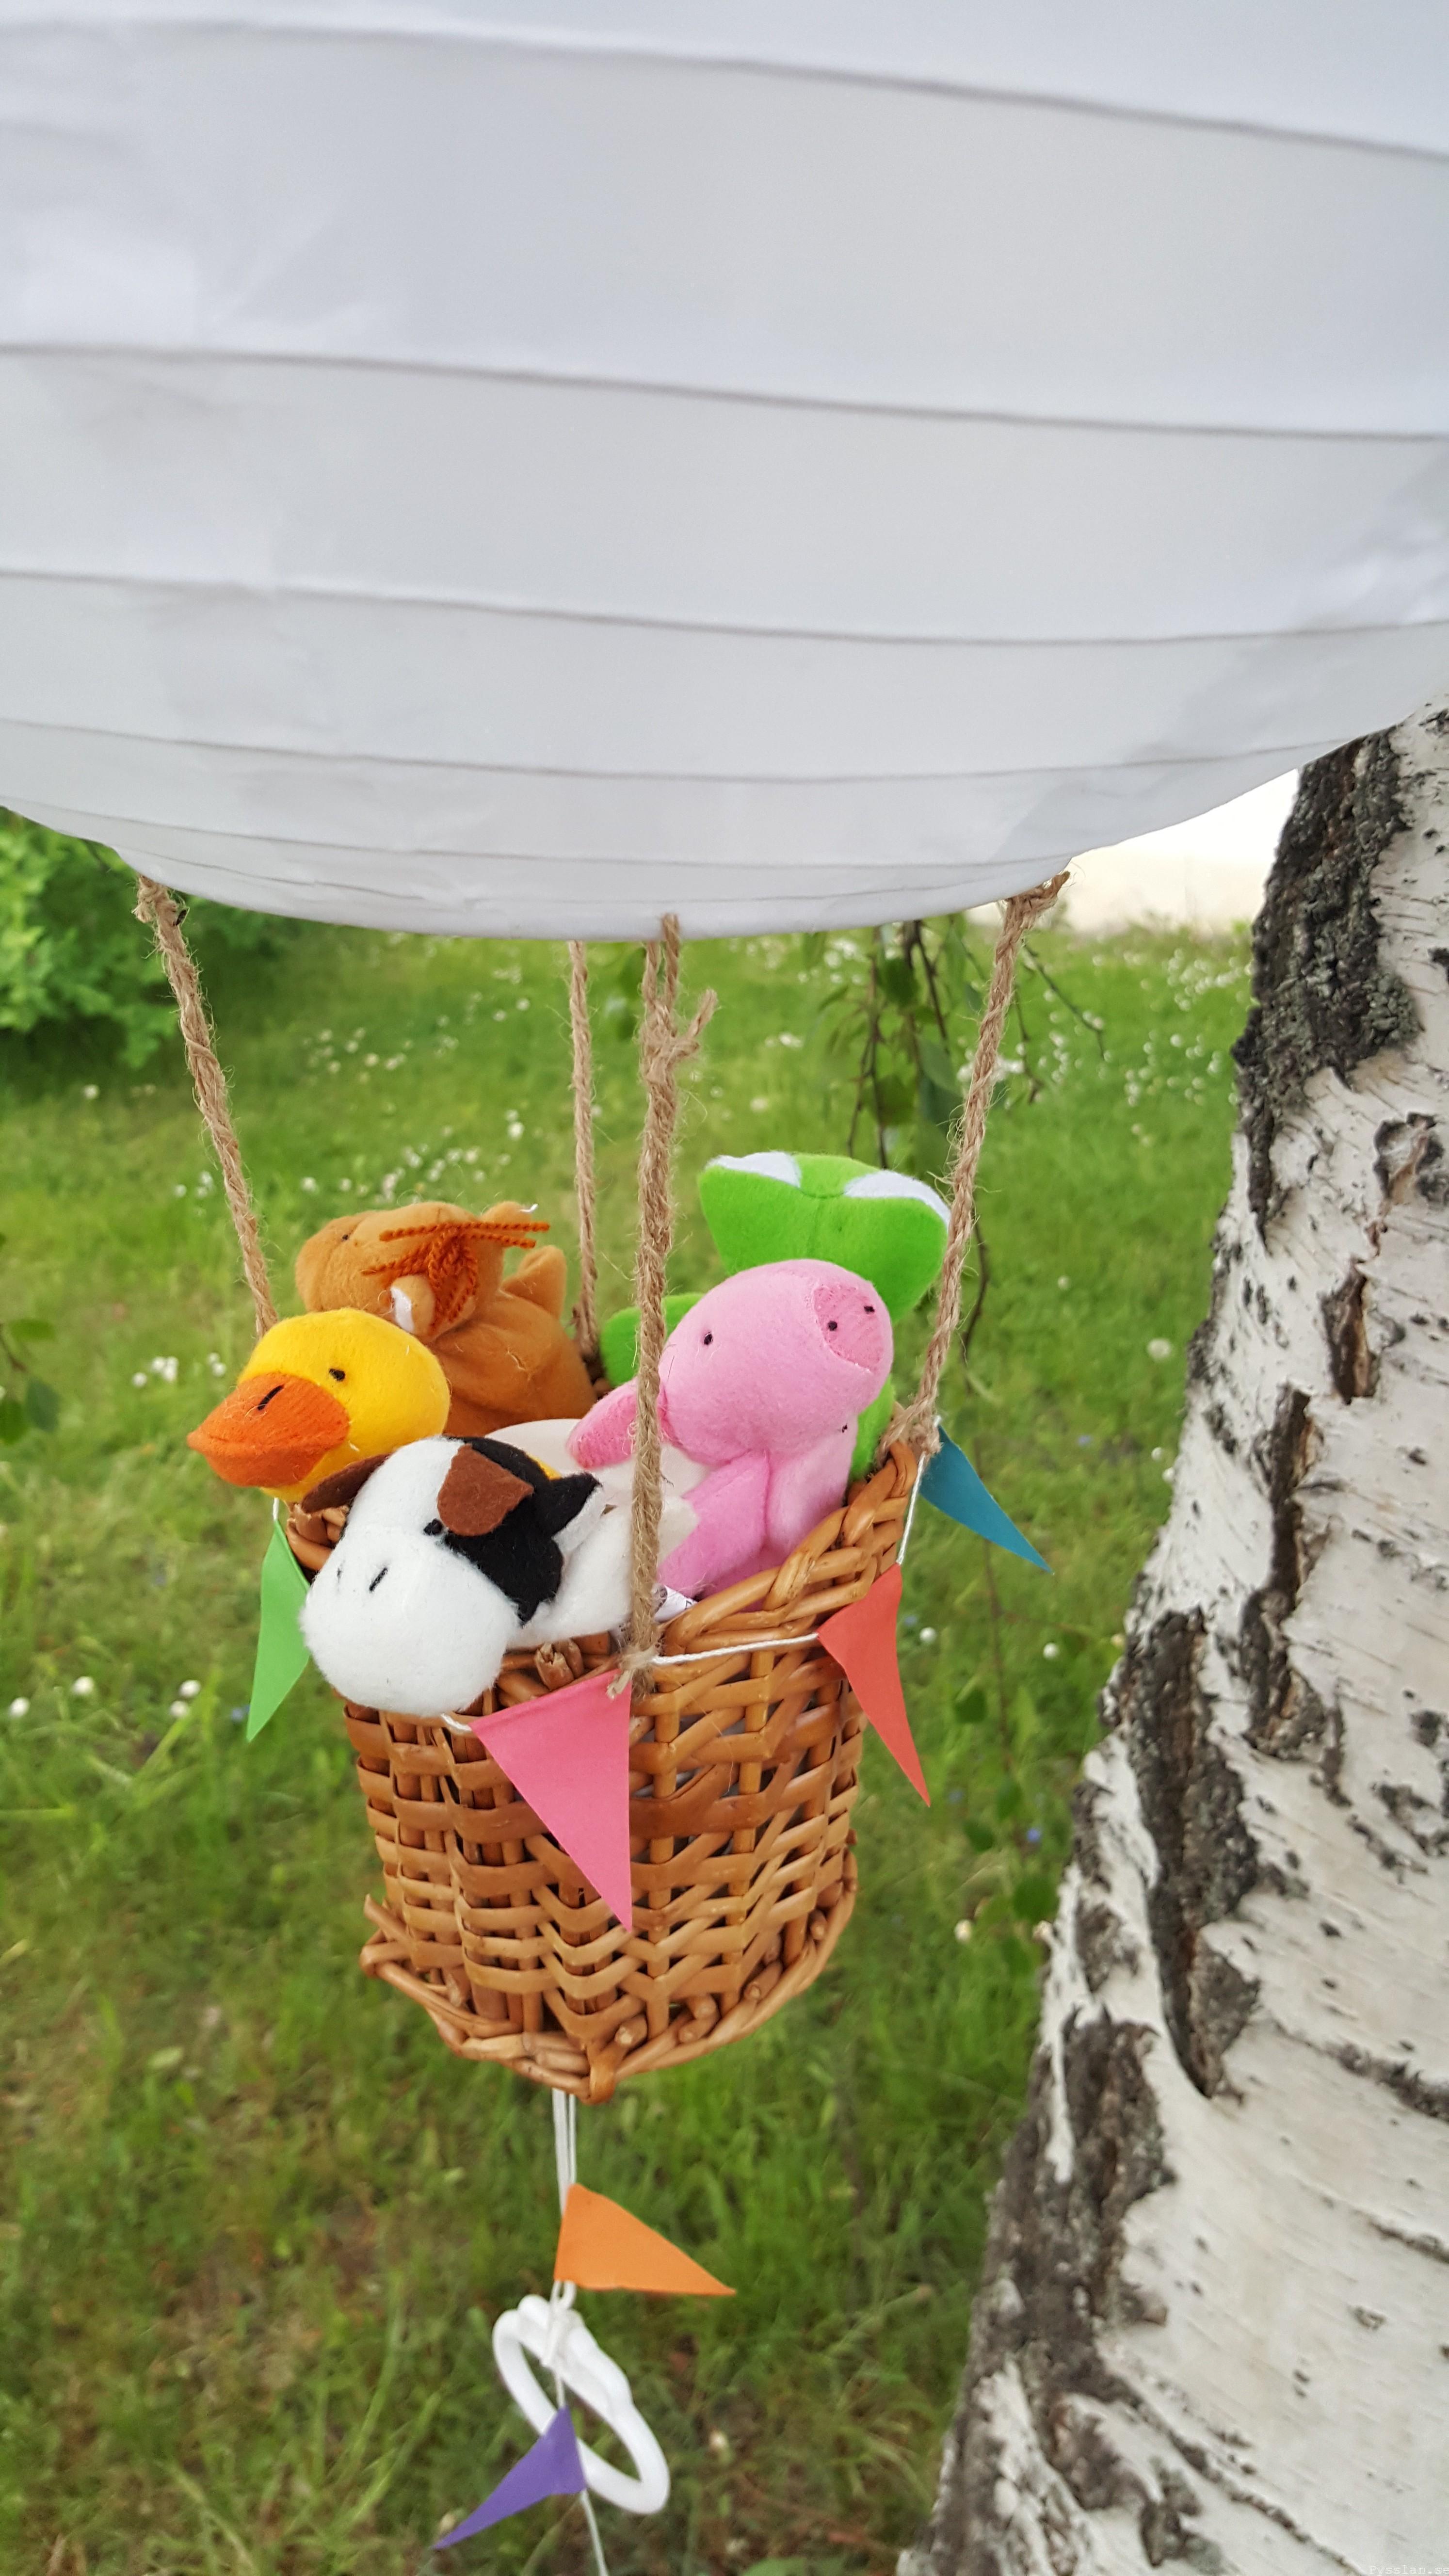 Luftballong doppresent baby speldosa pysslan blogg gossedjur flyger